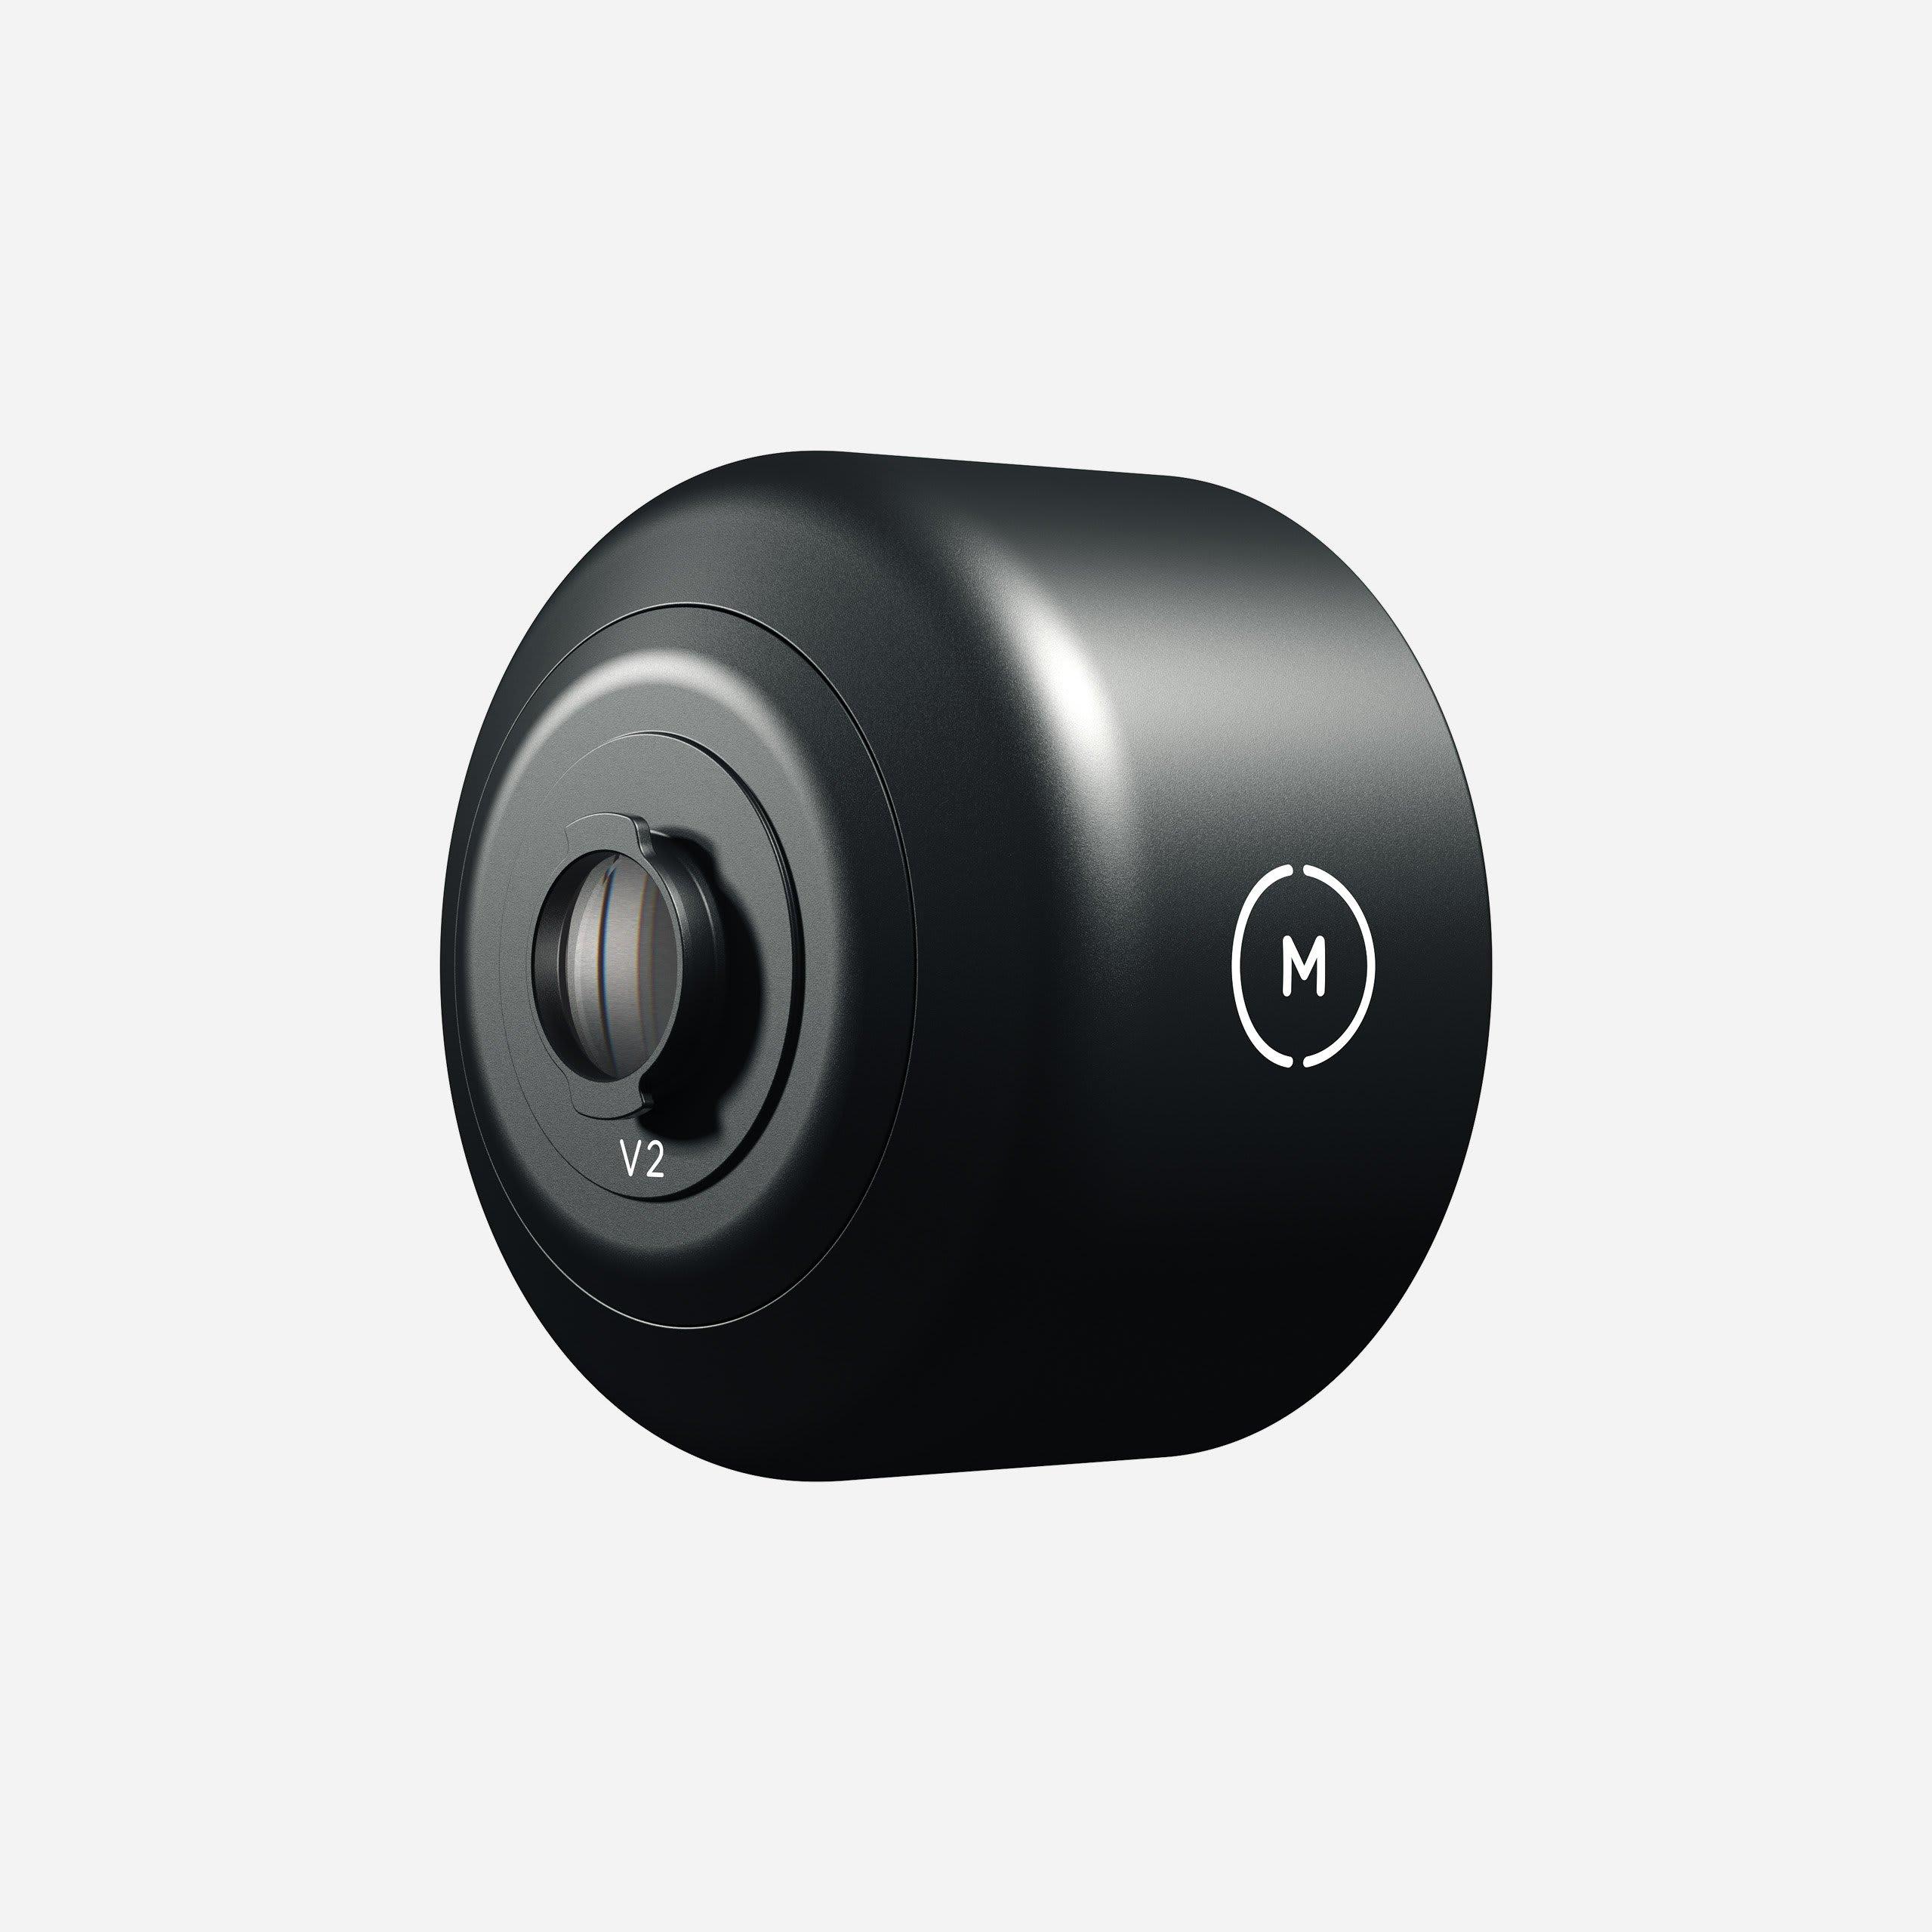 Moment Tele 58mm Lens Back Side